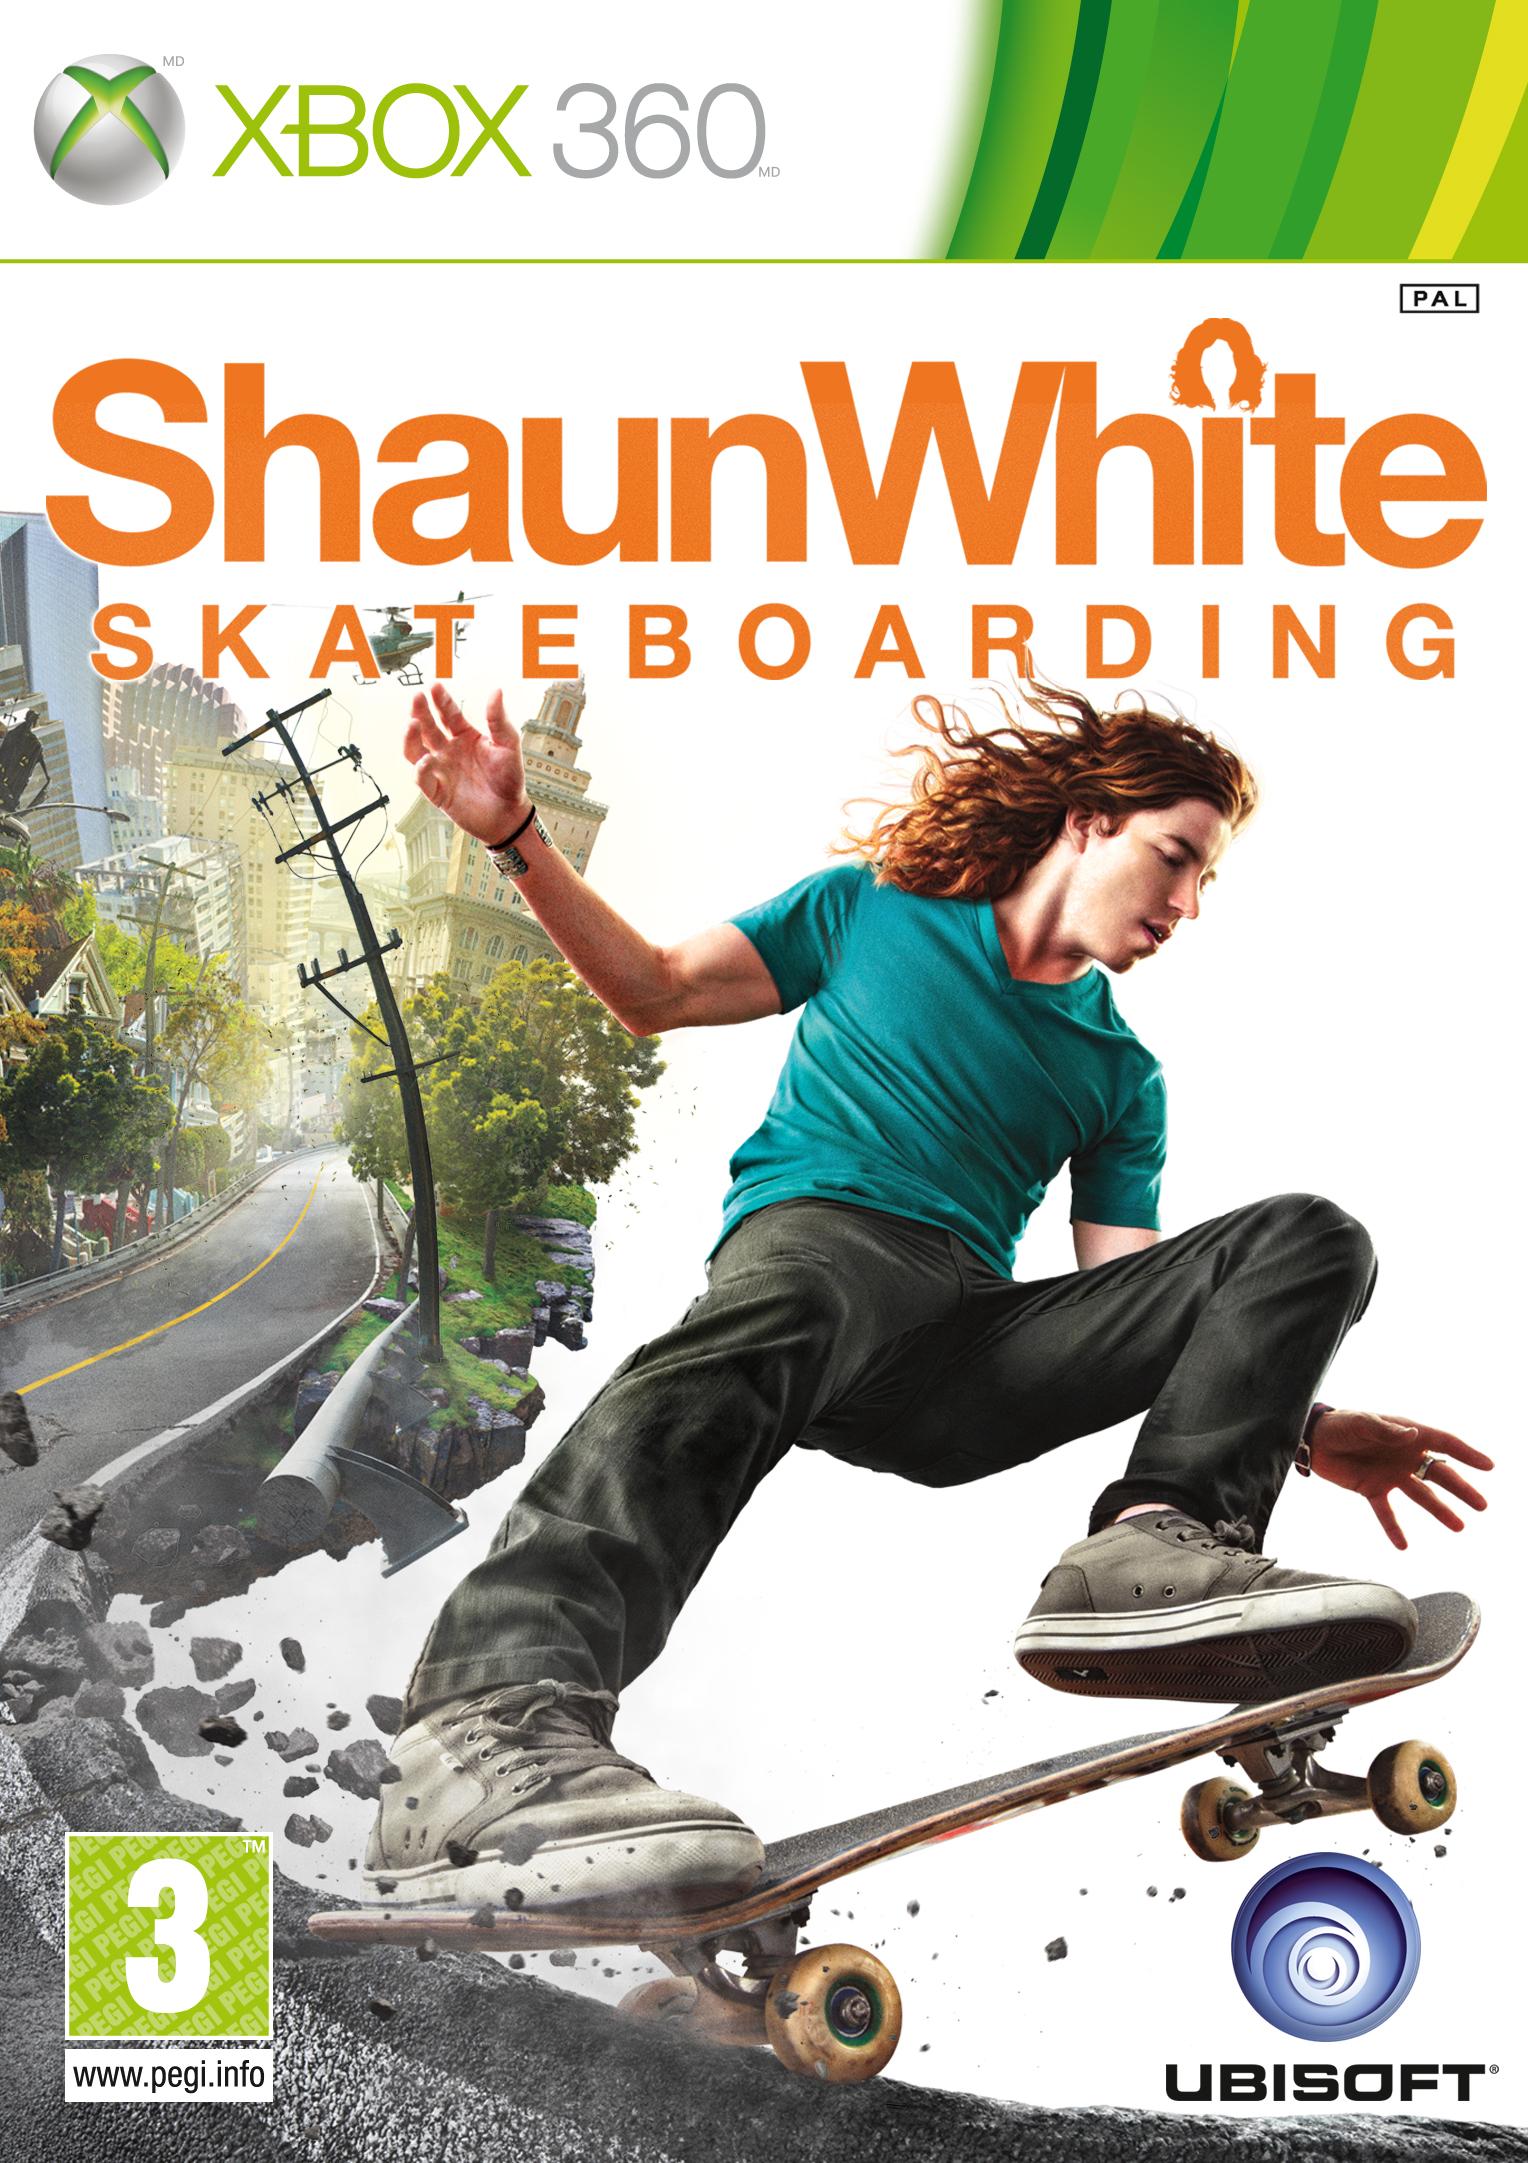 Shaun White Skateboarding REGION FREE.